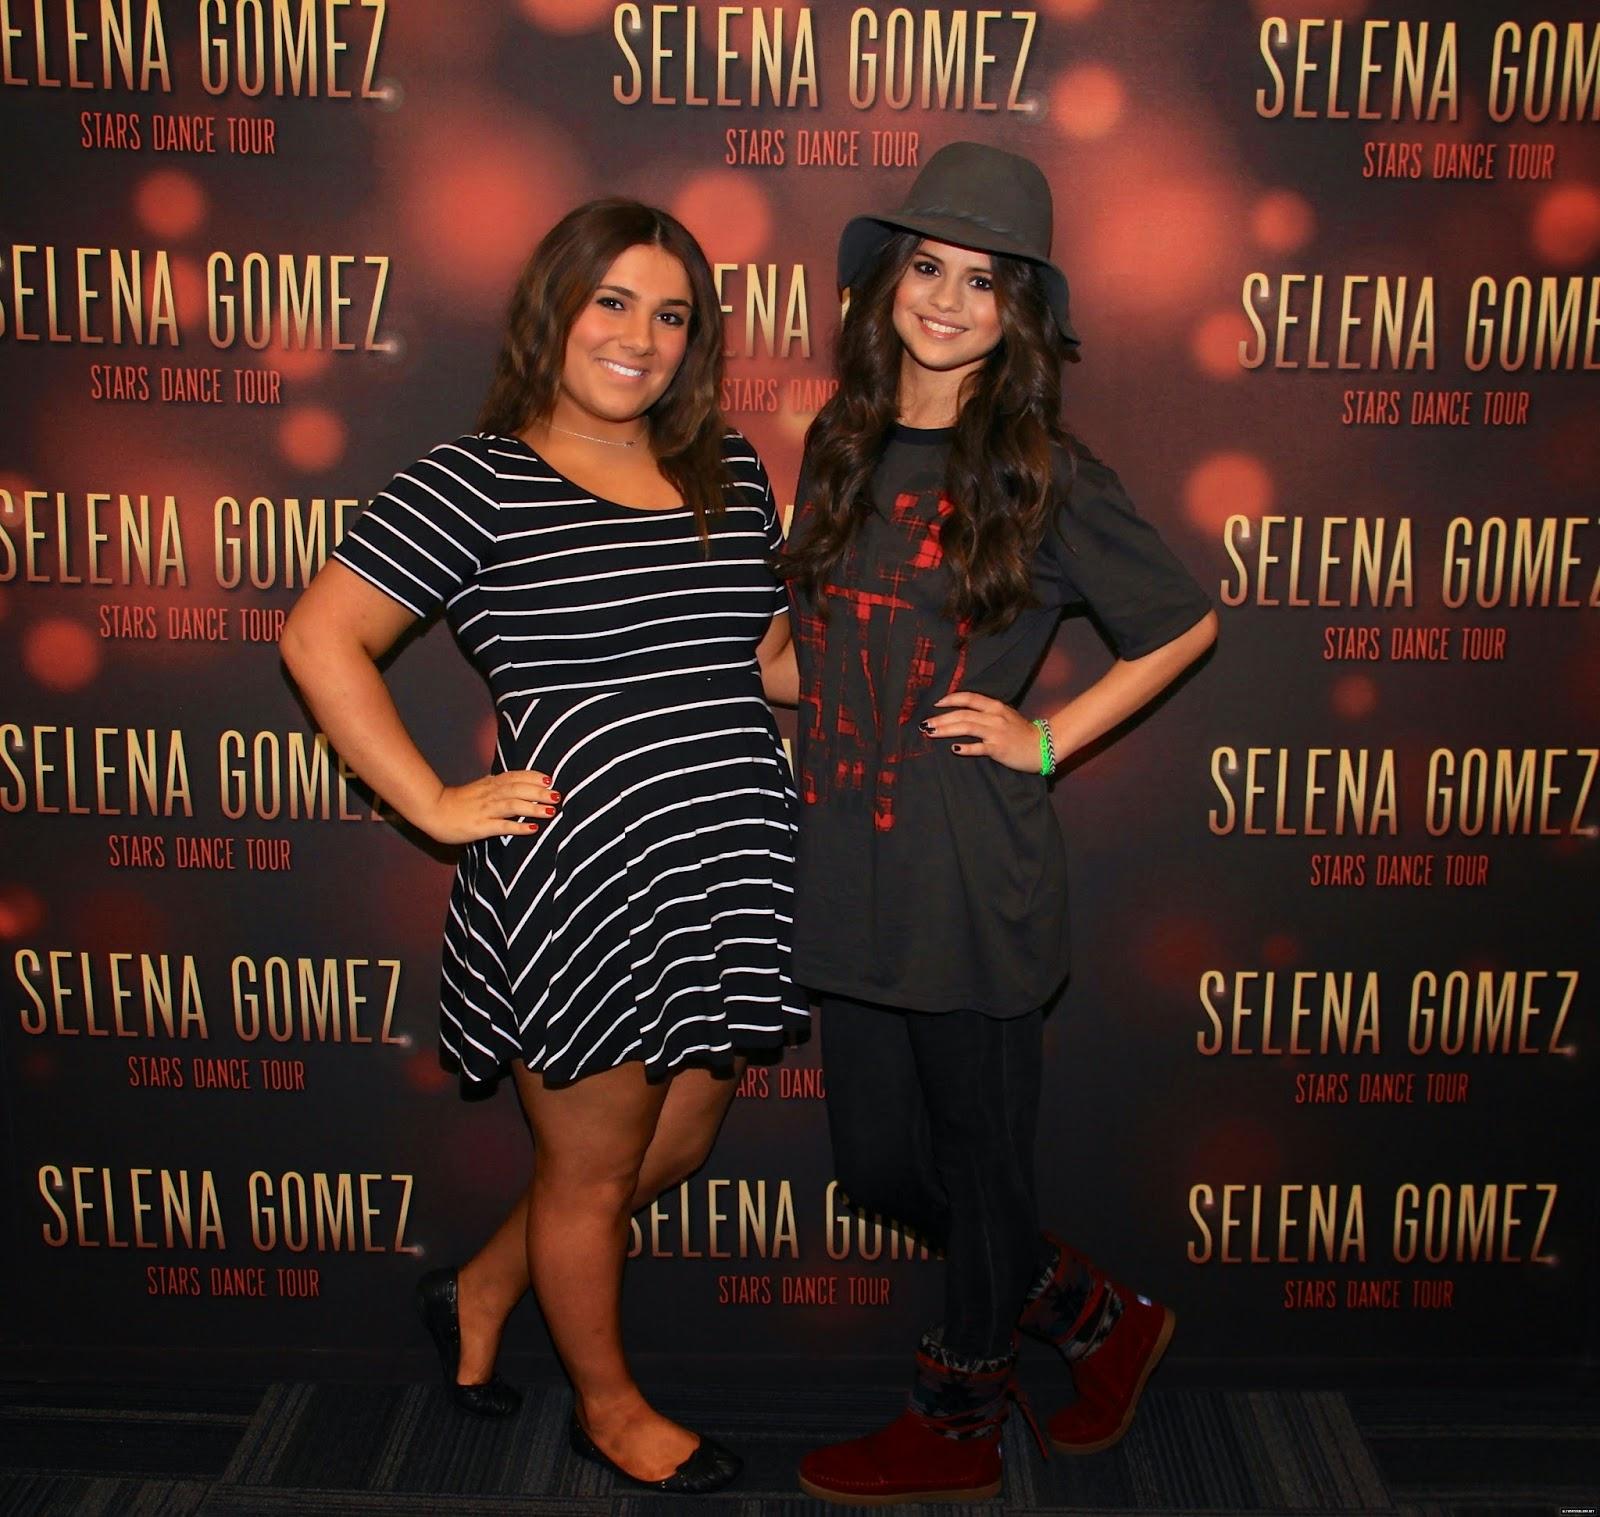 Selena gomez style stars dance world tour meet greet auburn hills selena gomez style m4hsunfo